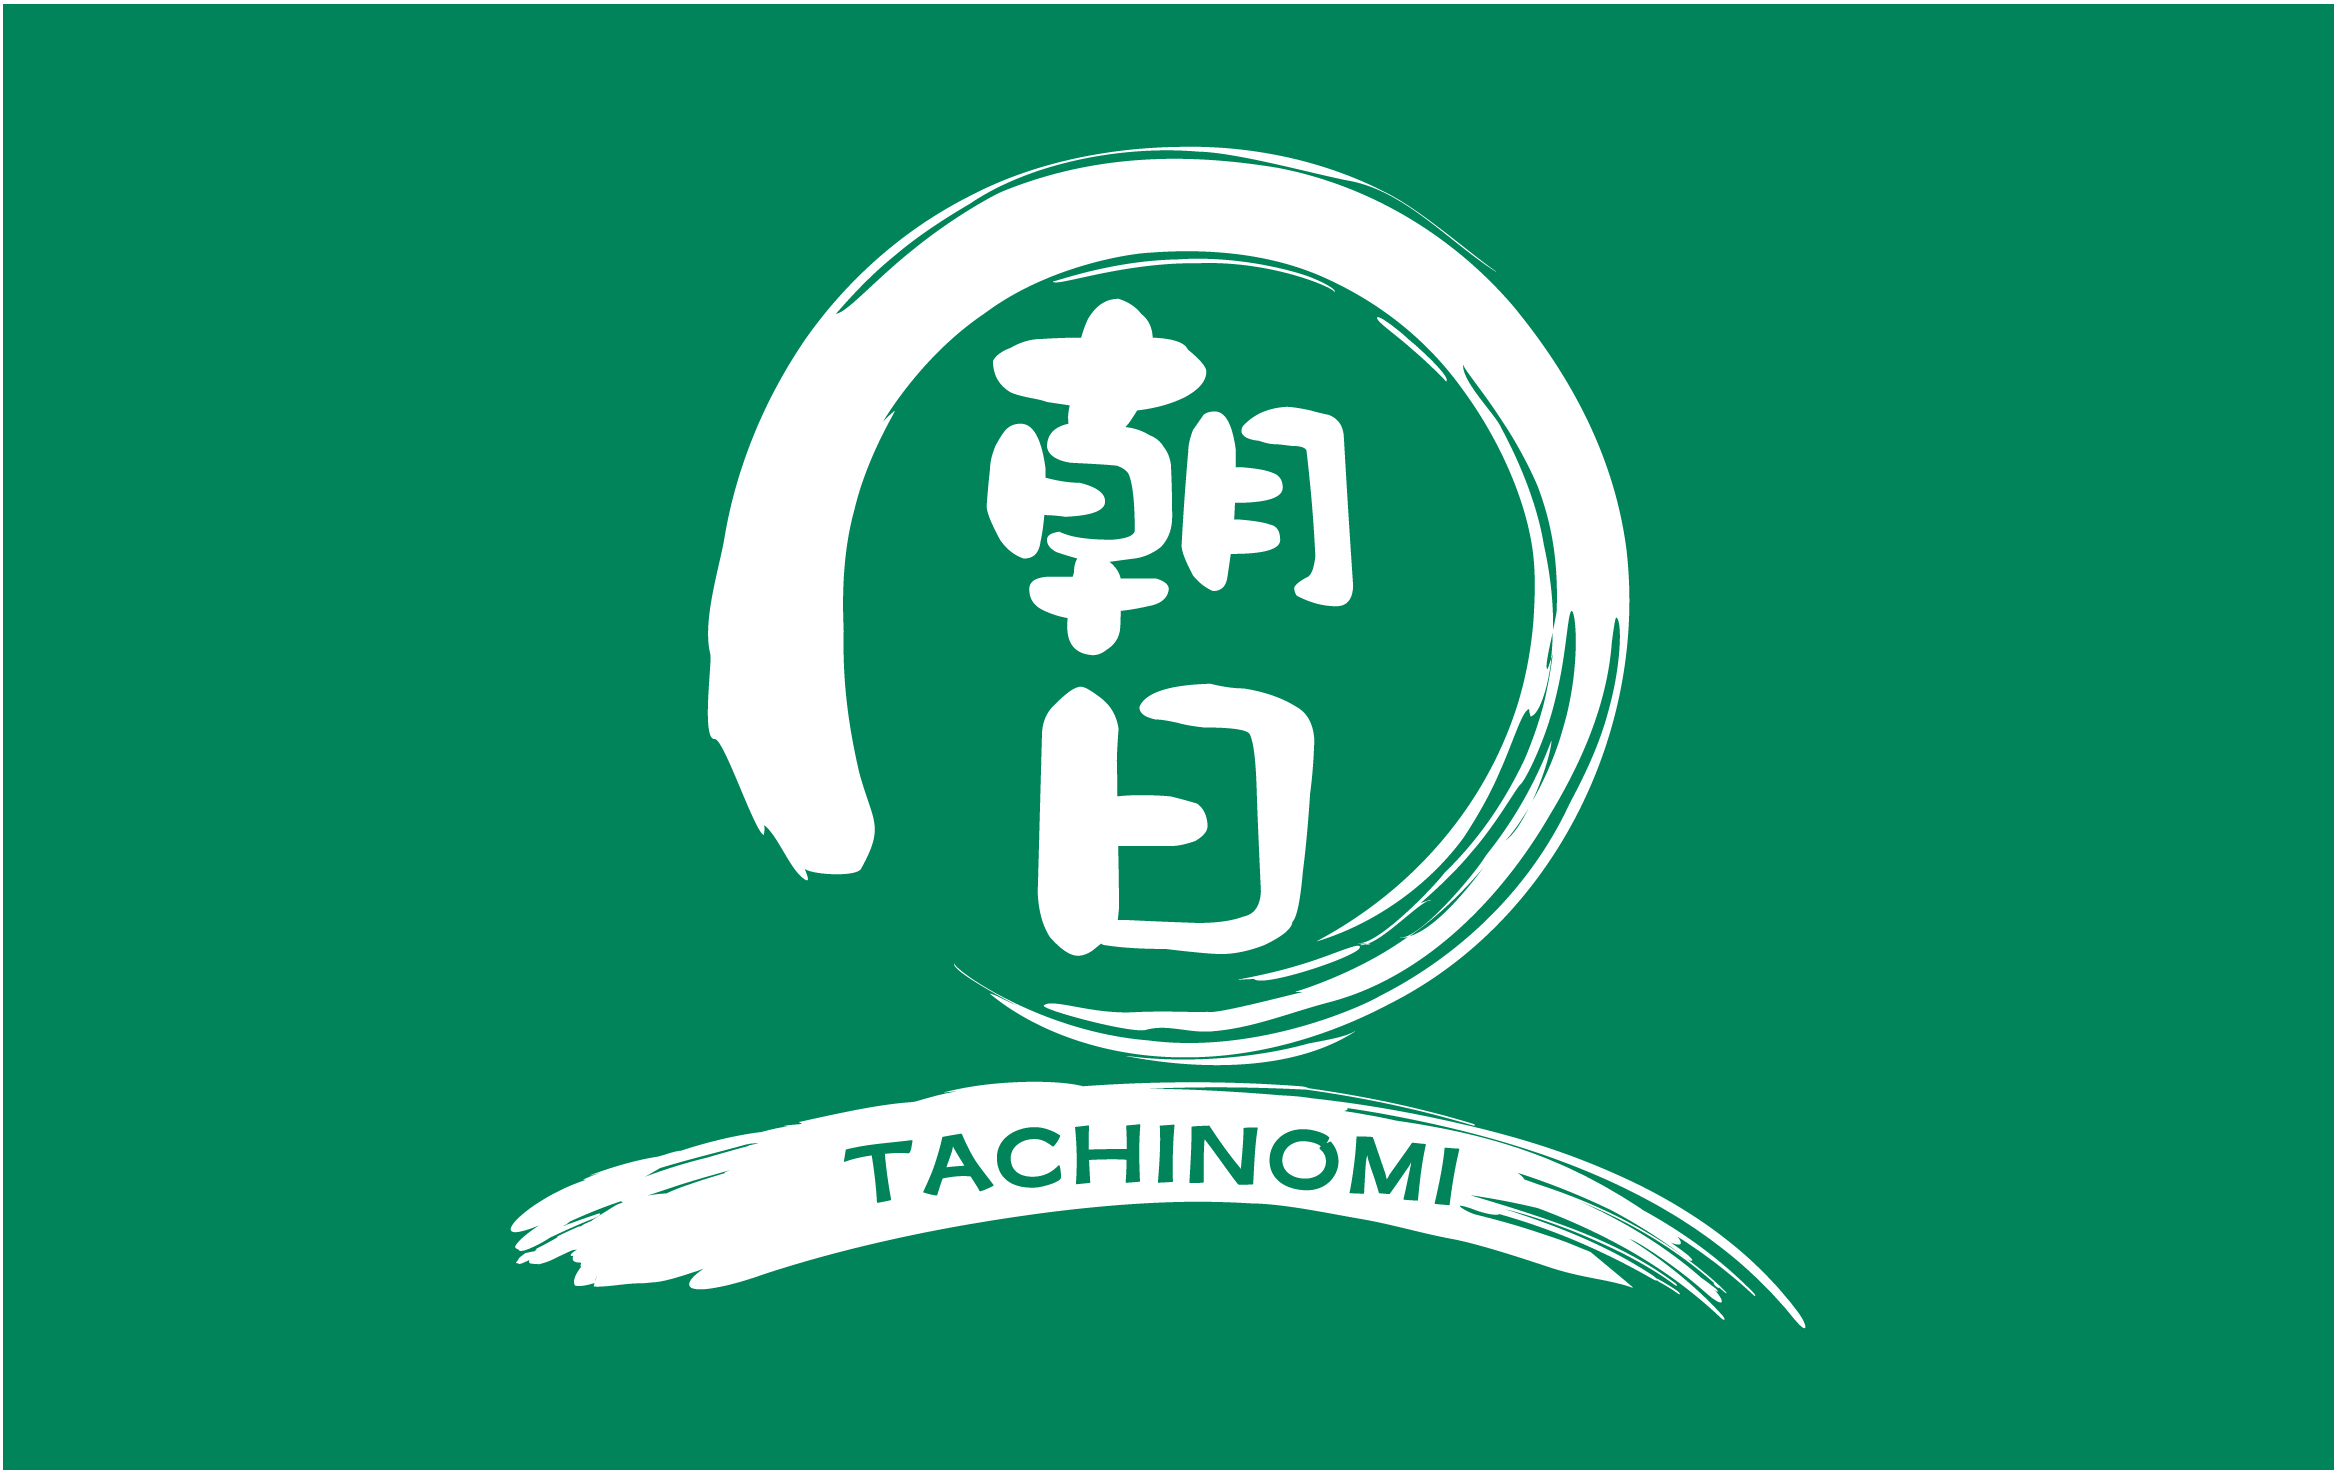 TACHINOMI 朝日様 ショップカード